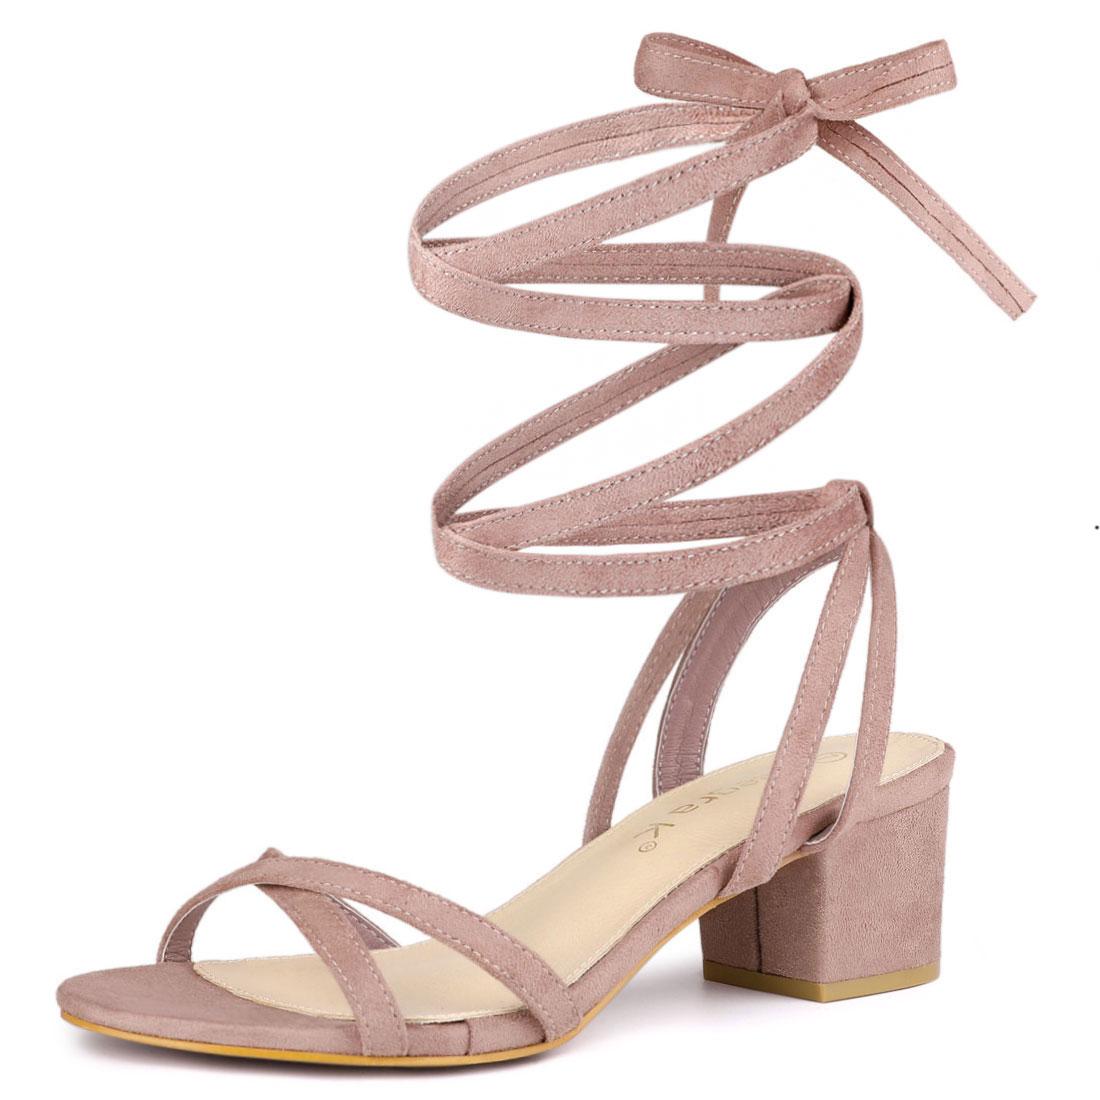 Allegra K Women's Open Toe Block Heels Lace Up Sandals Dust Pink US 9